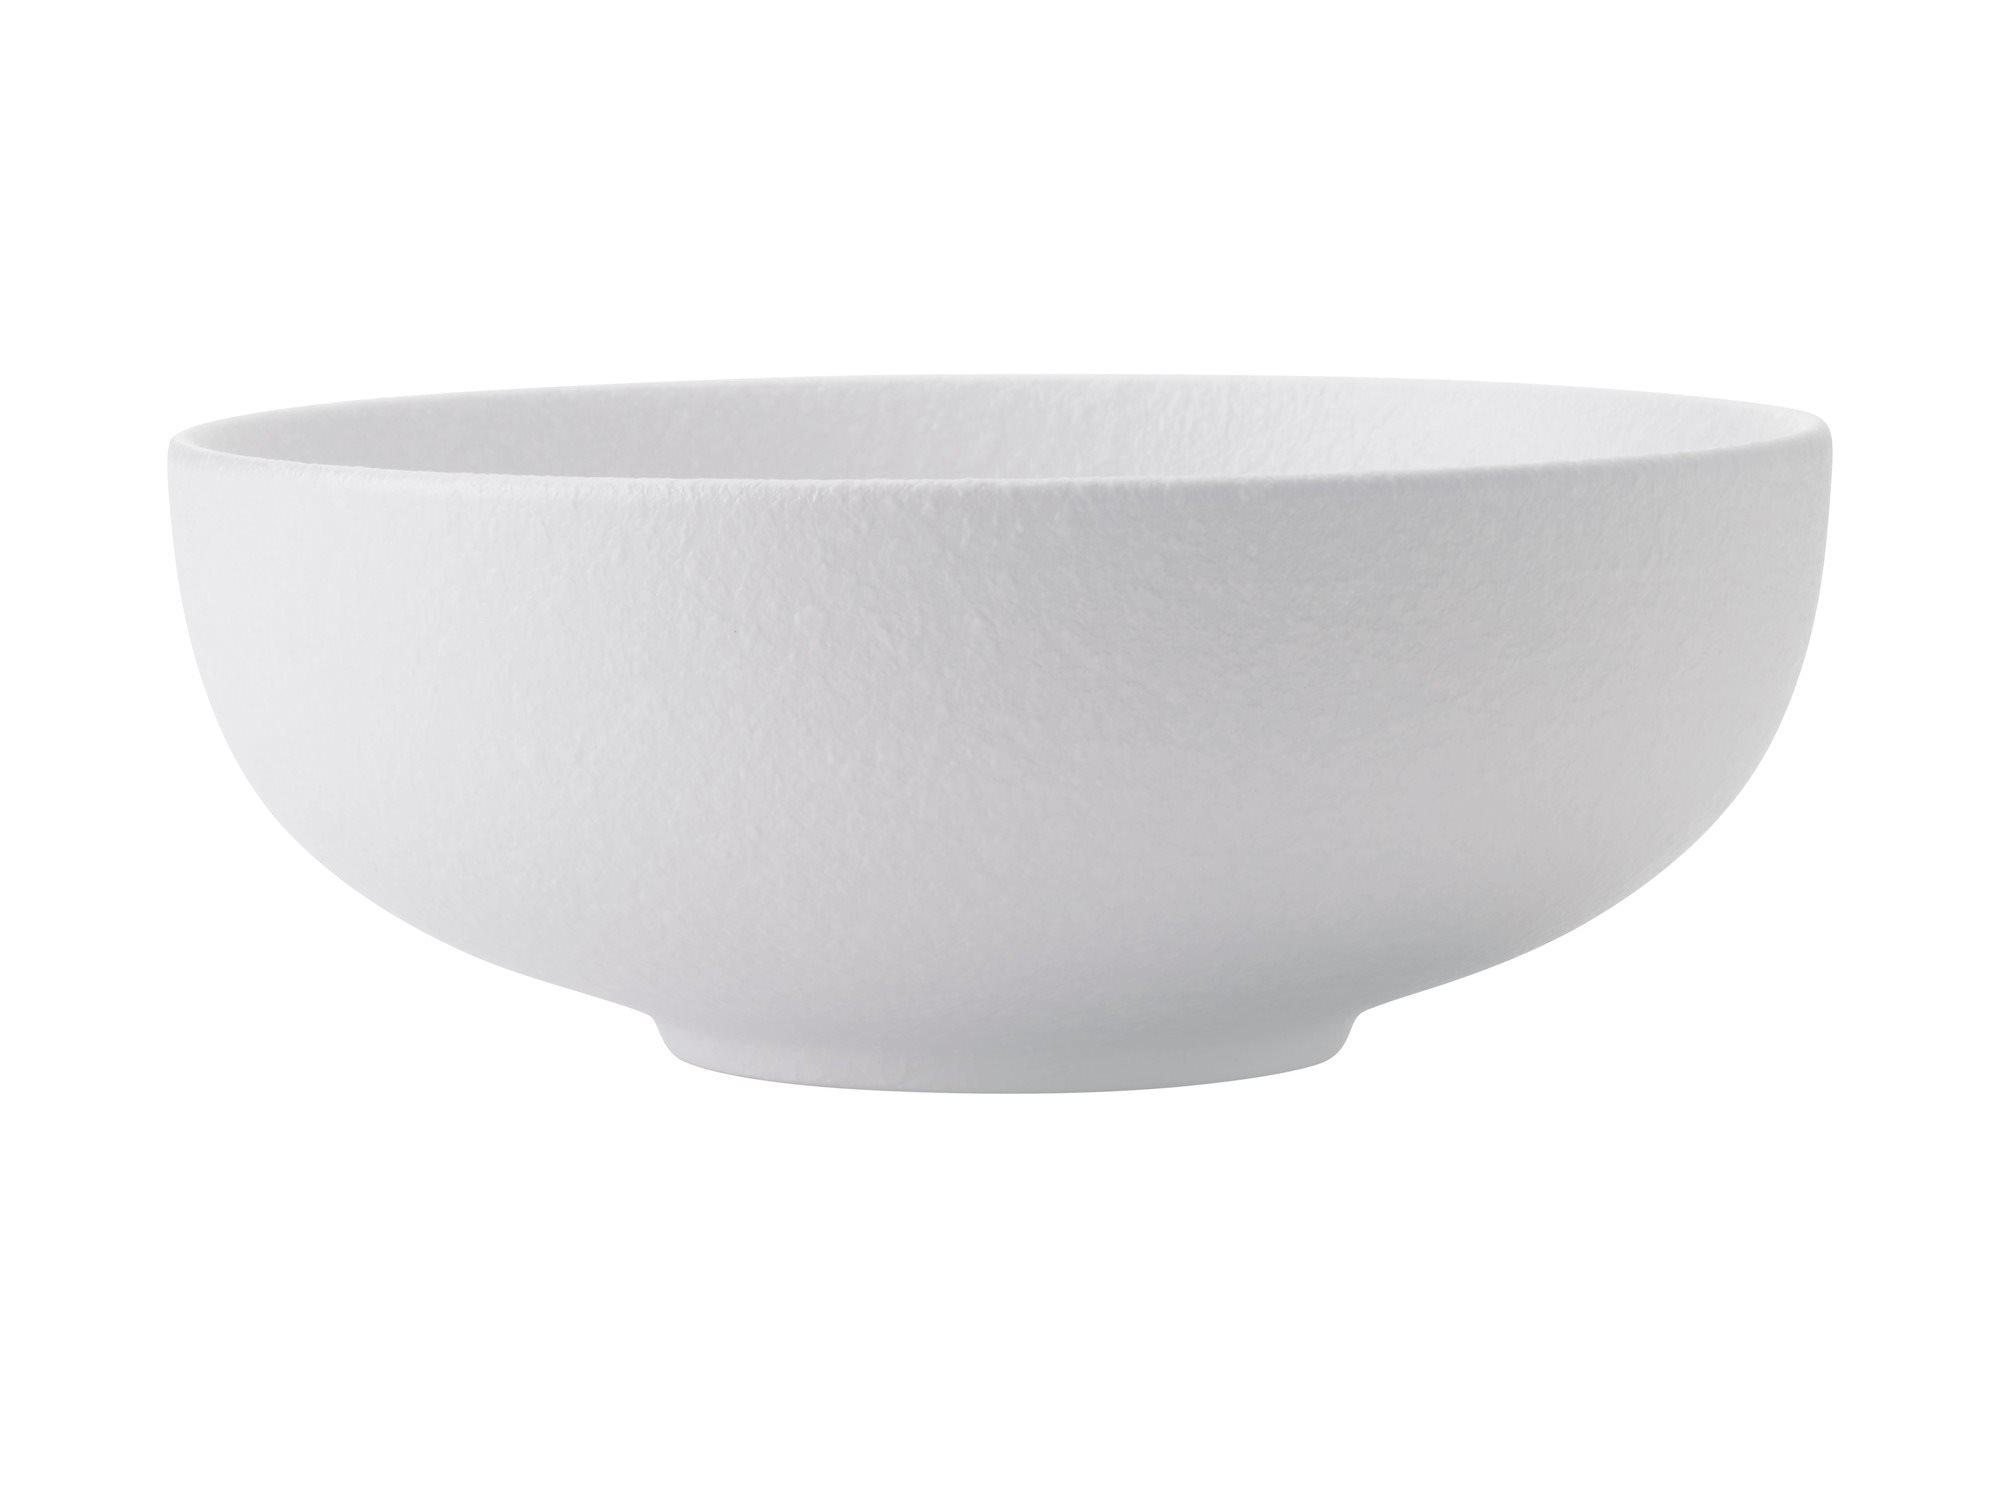 Maxwell & Williams Μπολ Coupe Λευκό Caviar 19cm